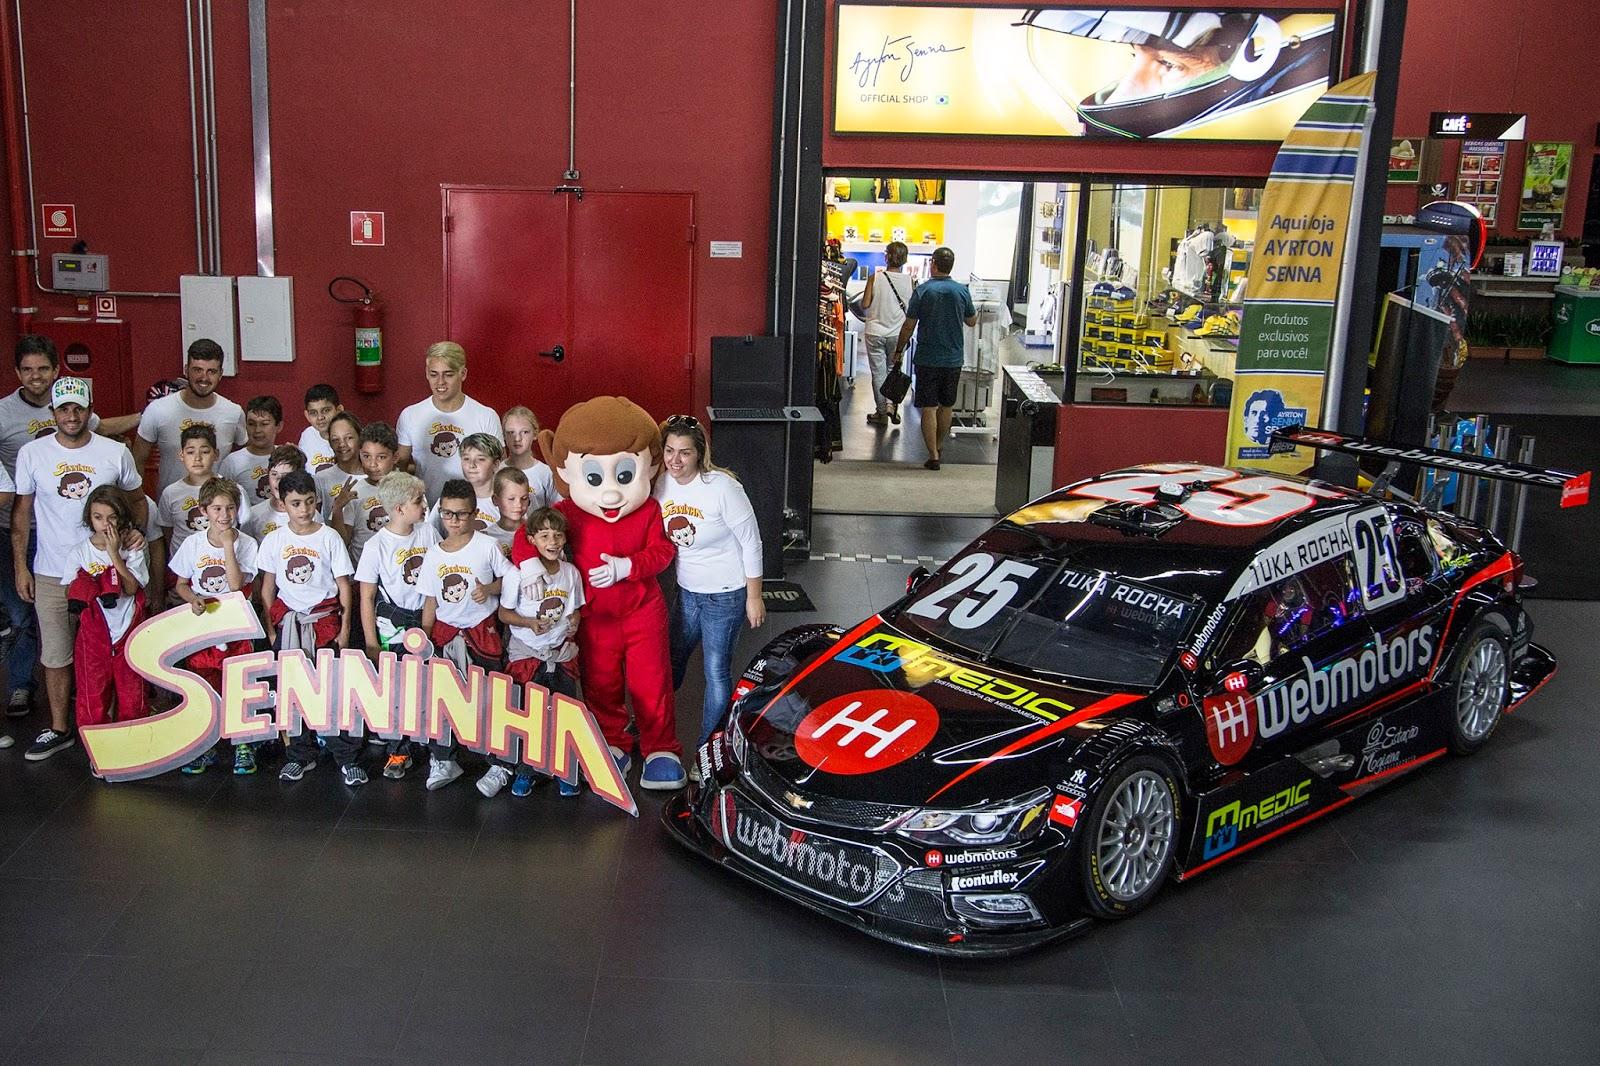 Stock Car  Tuka Rocha lança seu carro da temporada 2017Stock Car  Tuka  Rocha lança seu carro da temporada 2017 3e2487eca25ea